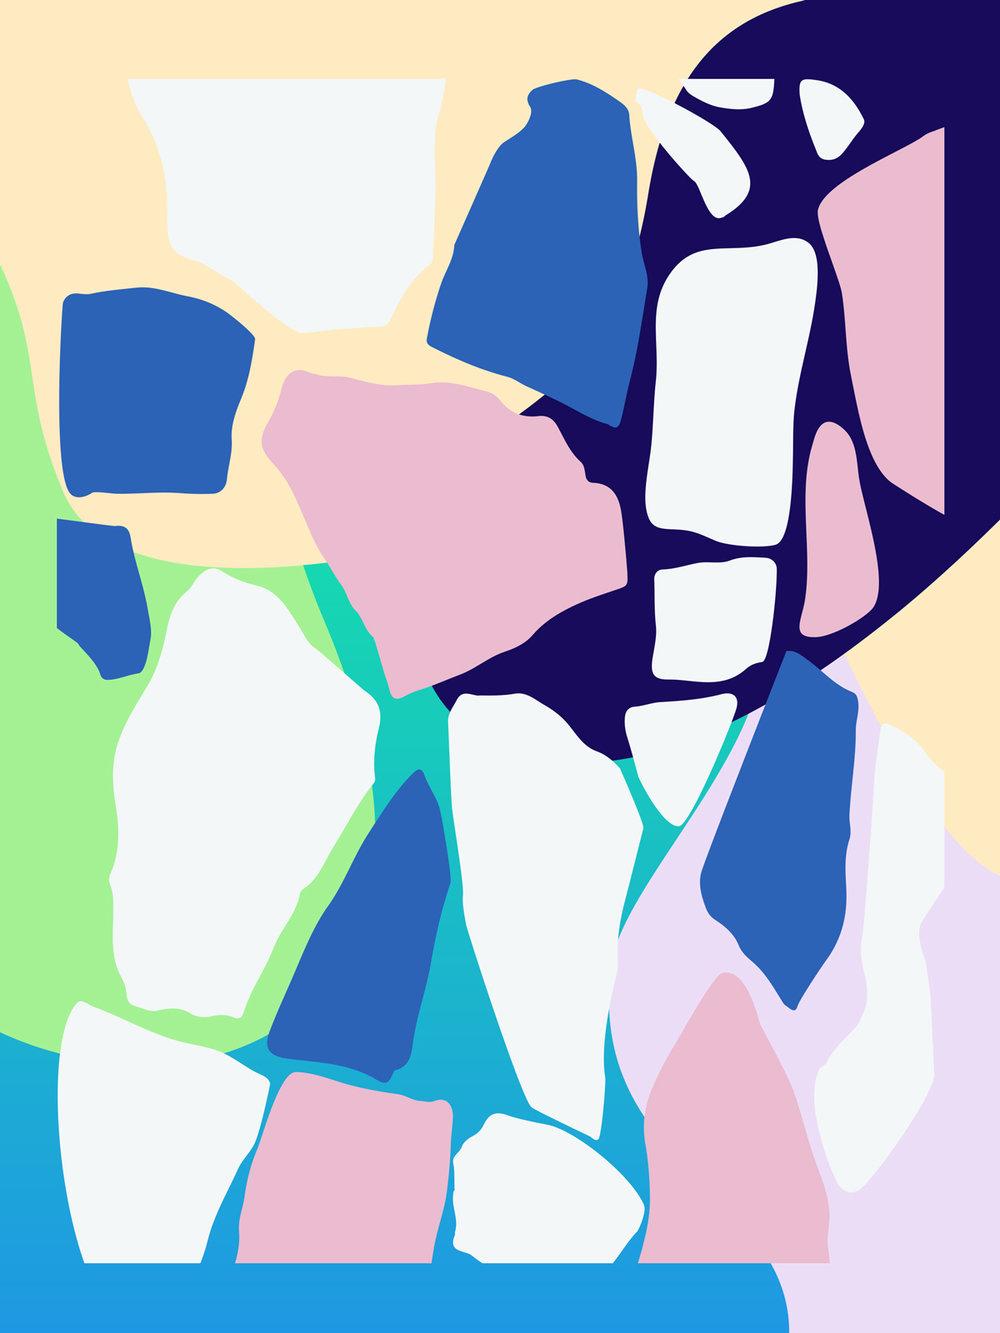 CO_08.jpg